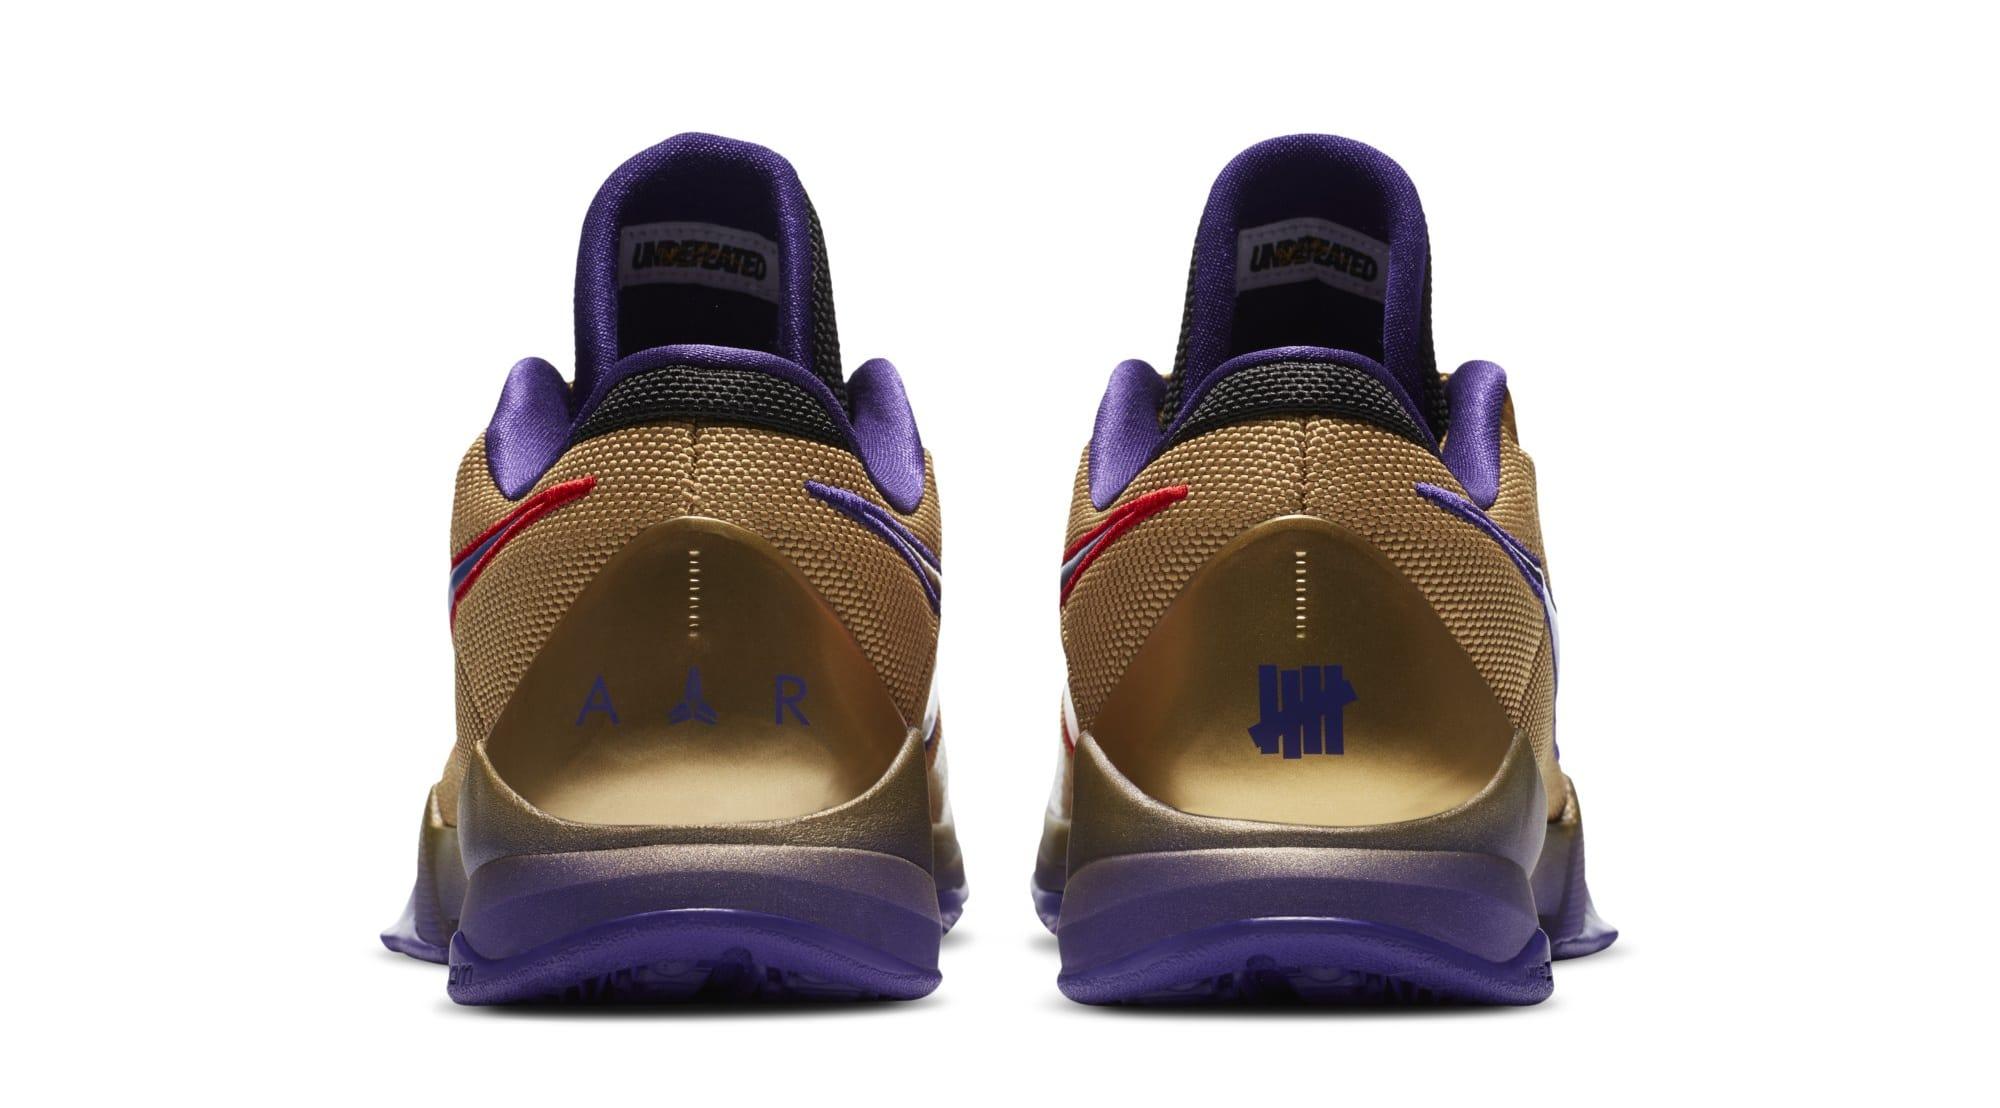 Undefeated x Nike Kobe 5 Protro 'Hall of Fame' DA6809-700 (Heel)